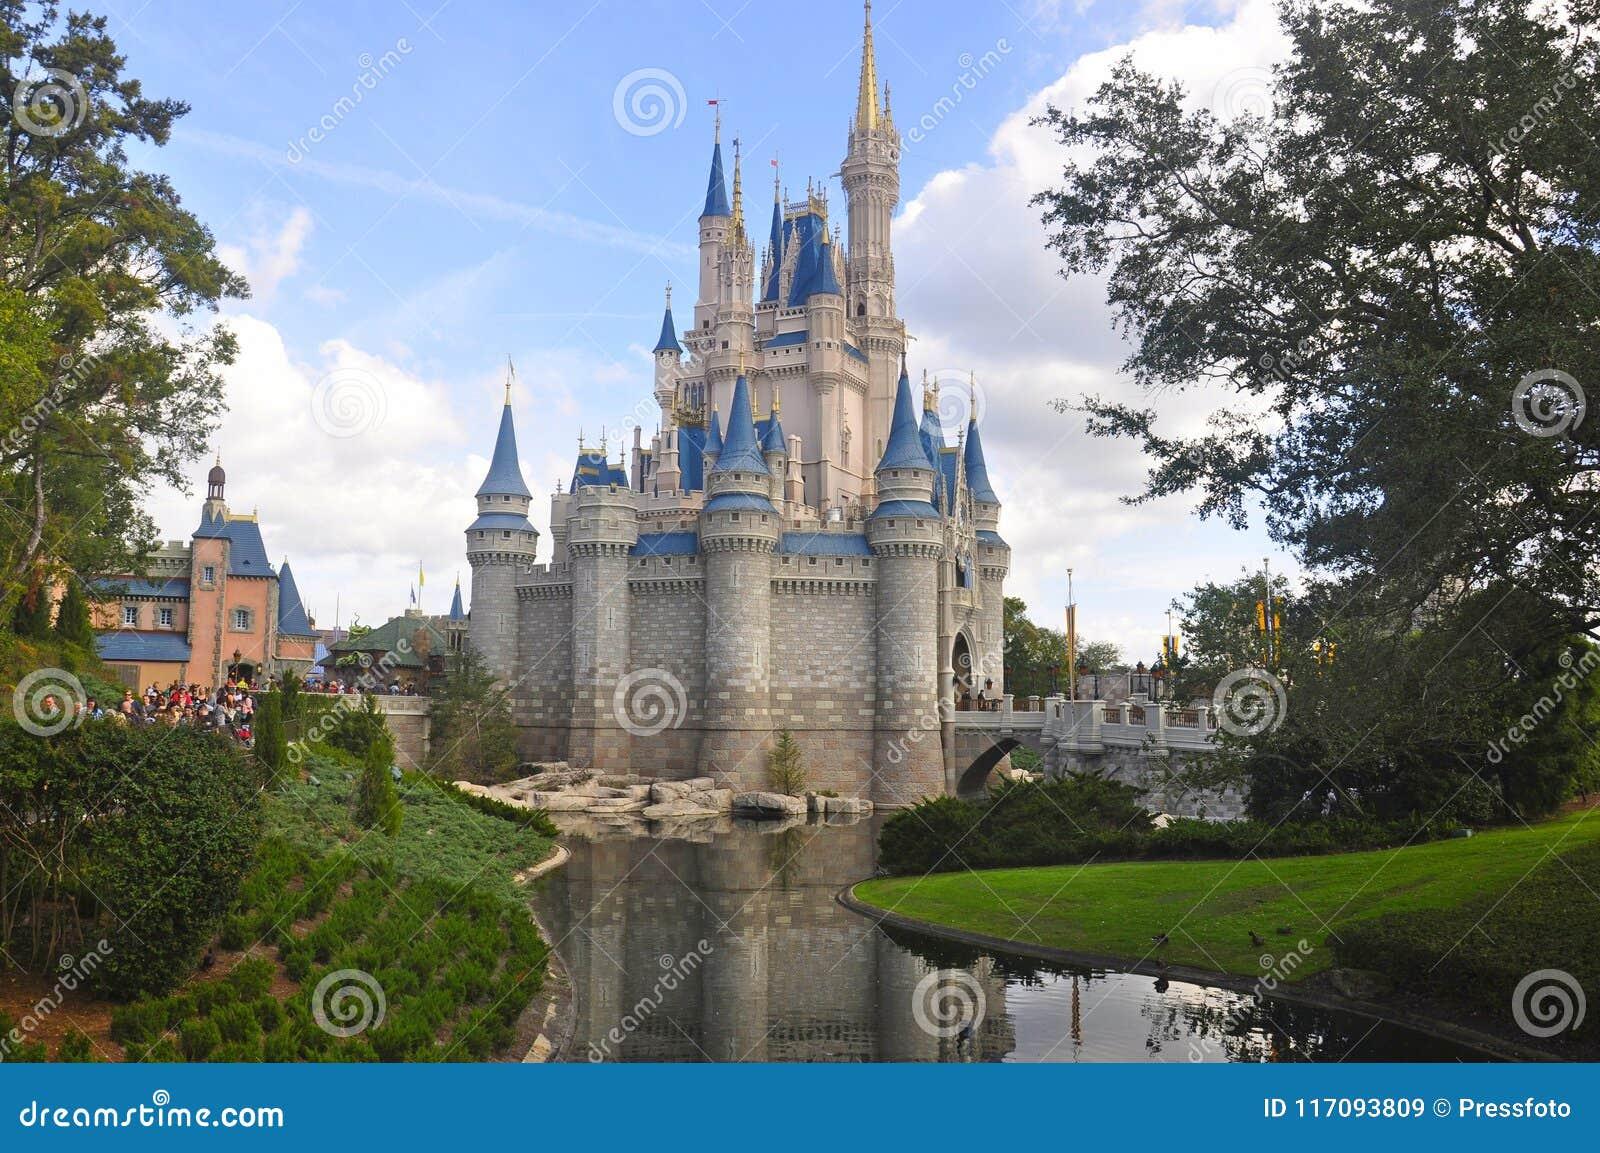 Cinderella Castle at Magic Kingdom park, Walt Disney World Resort Orlando, Florida, USA